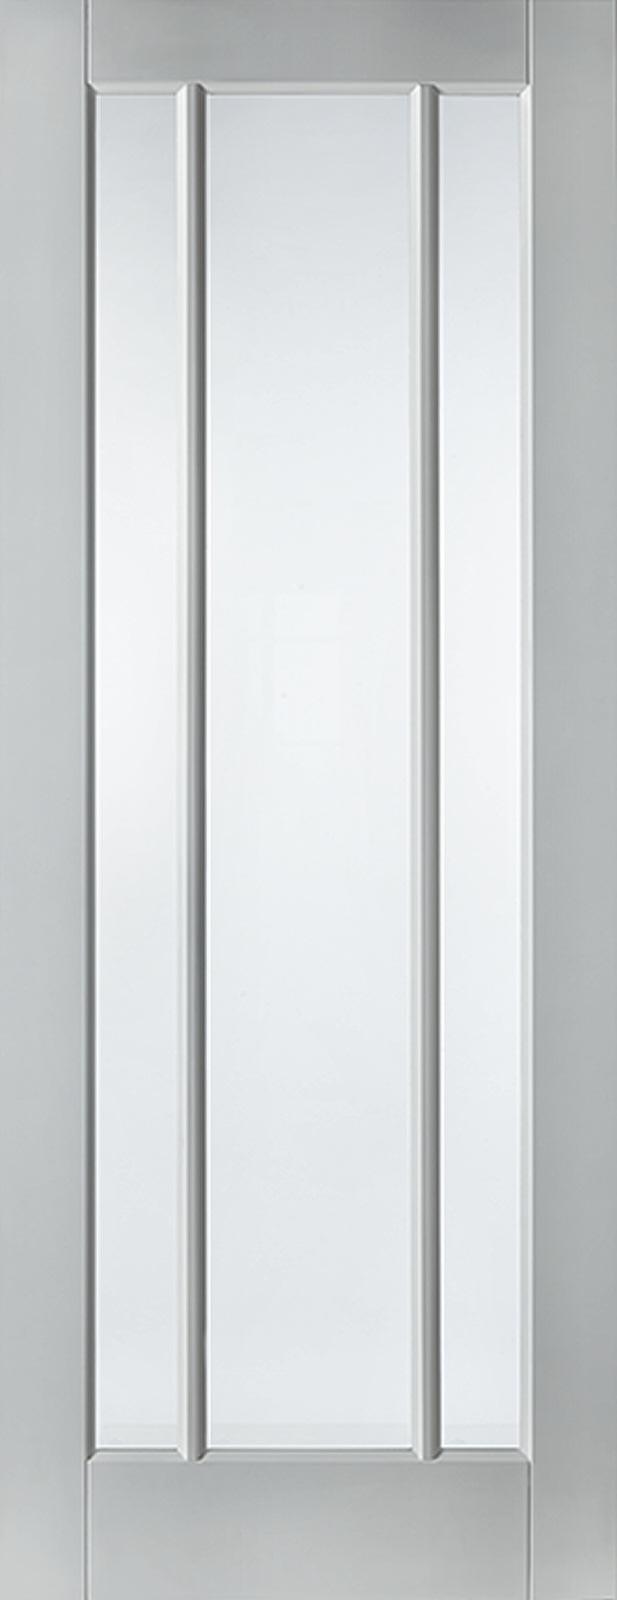 X 78 worcester clear glazed door in white 30 x 78 worcester clear glazed door in white rubansaba